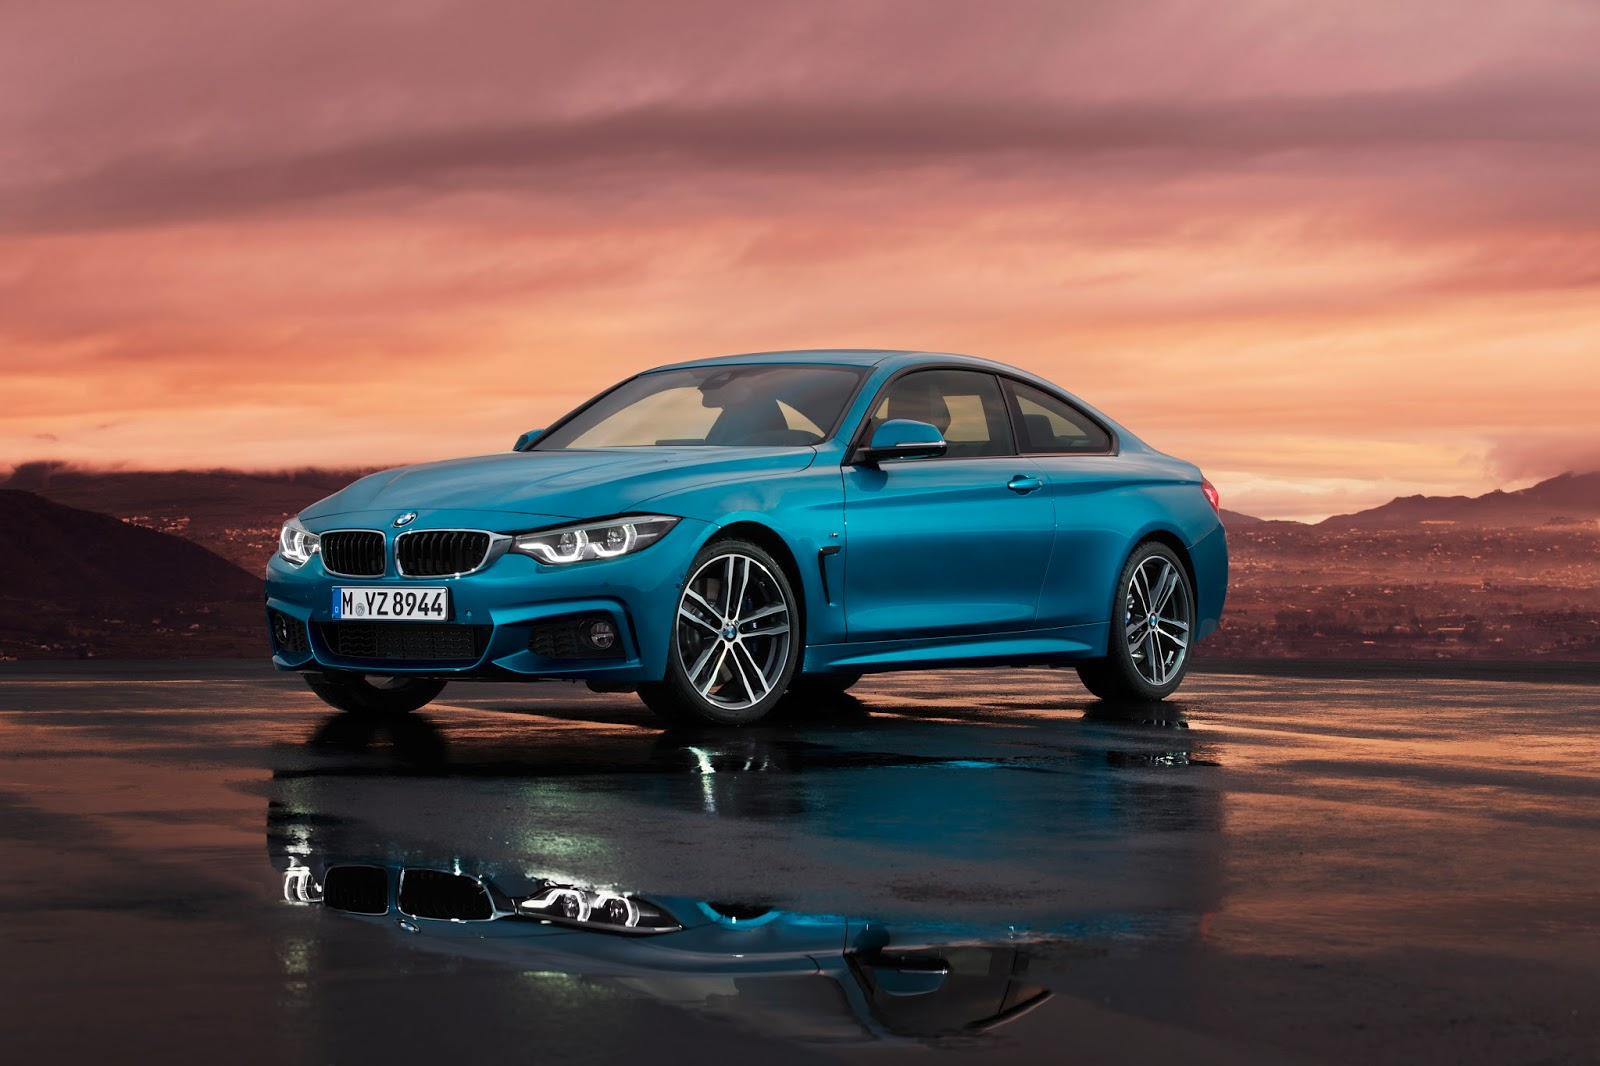 P90245212 highRes bmw 4 series m sport Η νέα BMW Σειρά 4, με πιο σφιχτή ρύθμιση ανάρτησης BMW, Bmw 4, BMW 4 Cabrio, BMW 4 Coupe, BMW 4 Gran Coupé, Facelift